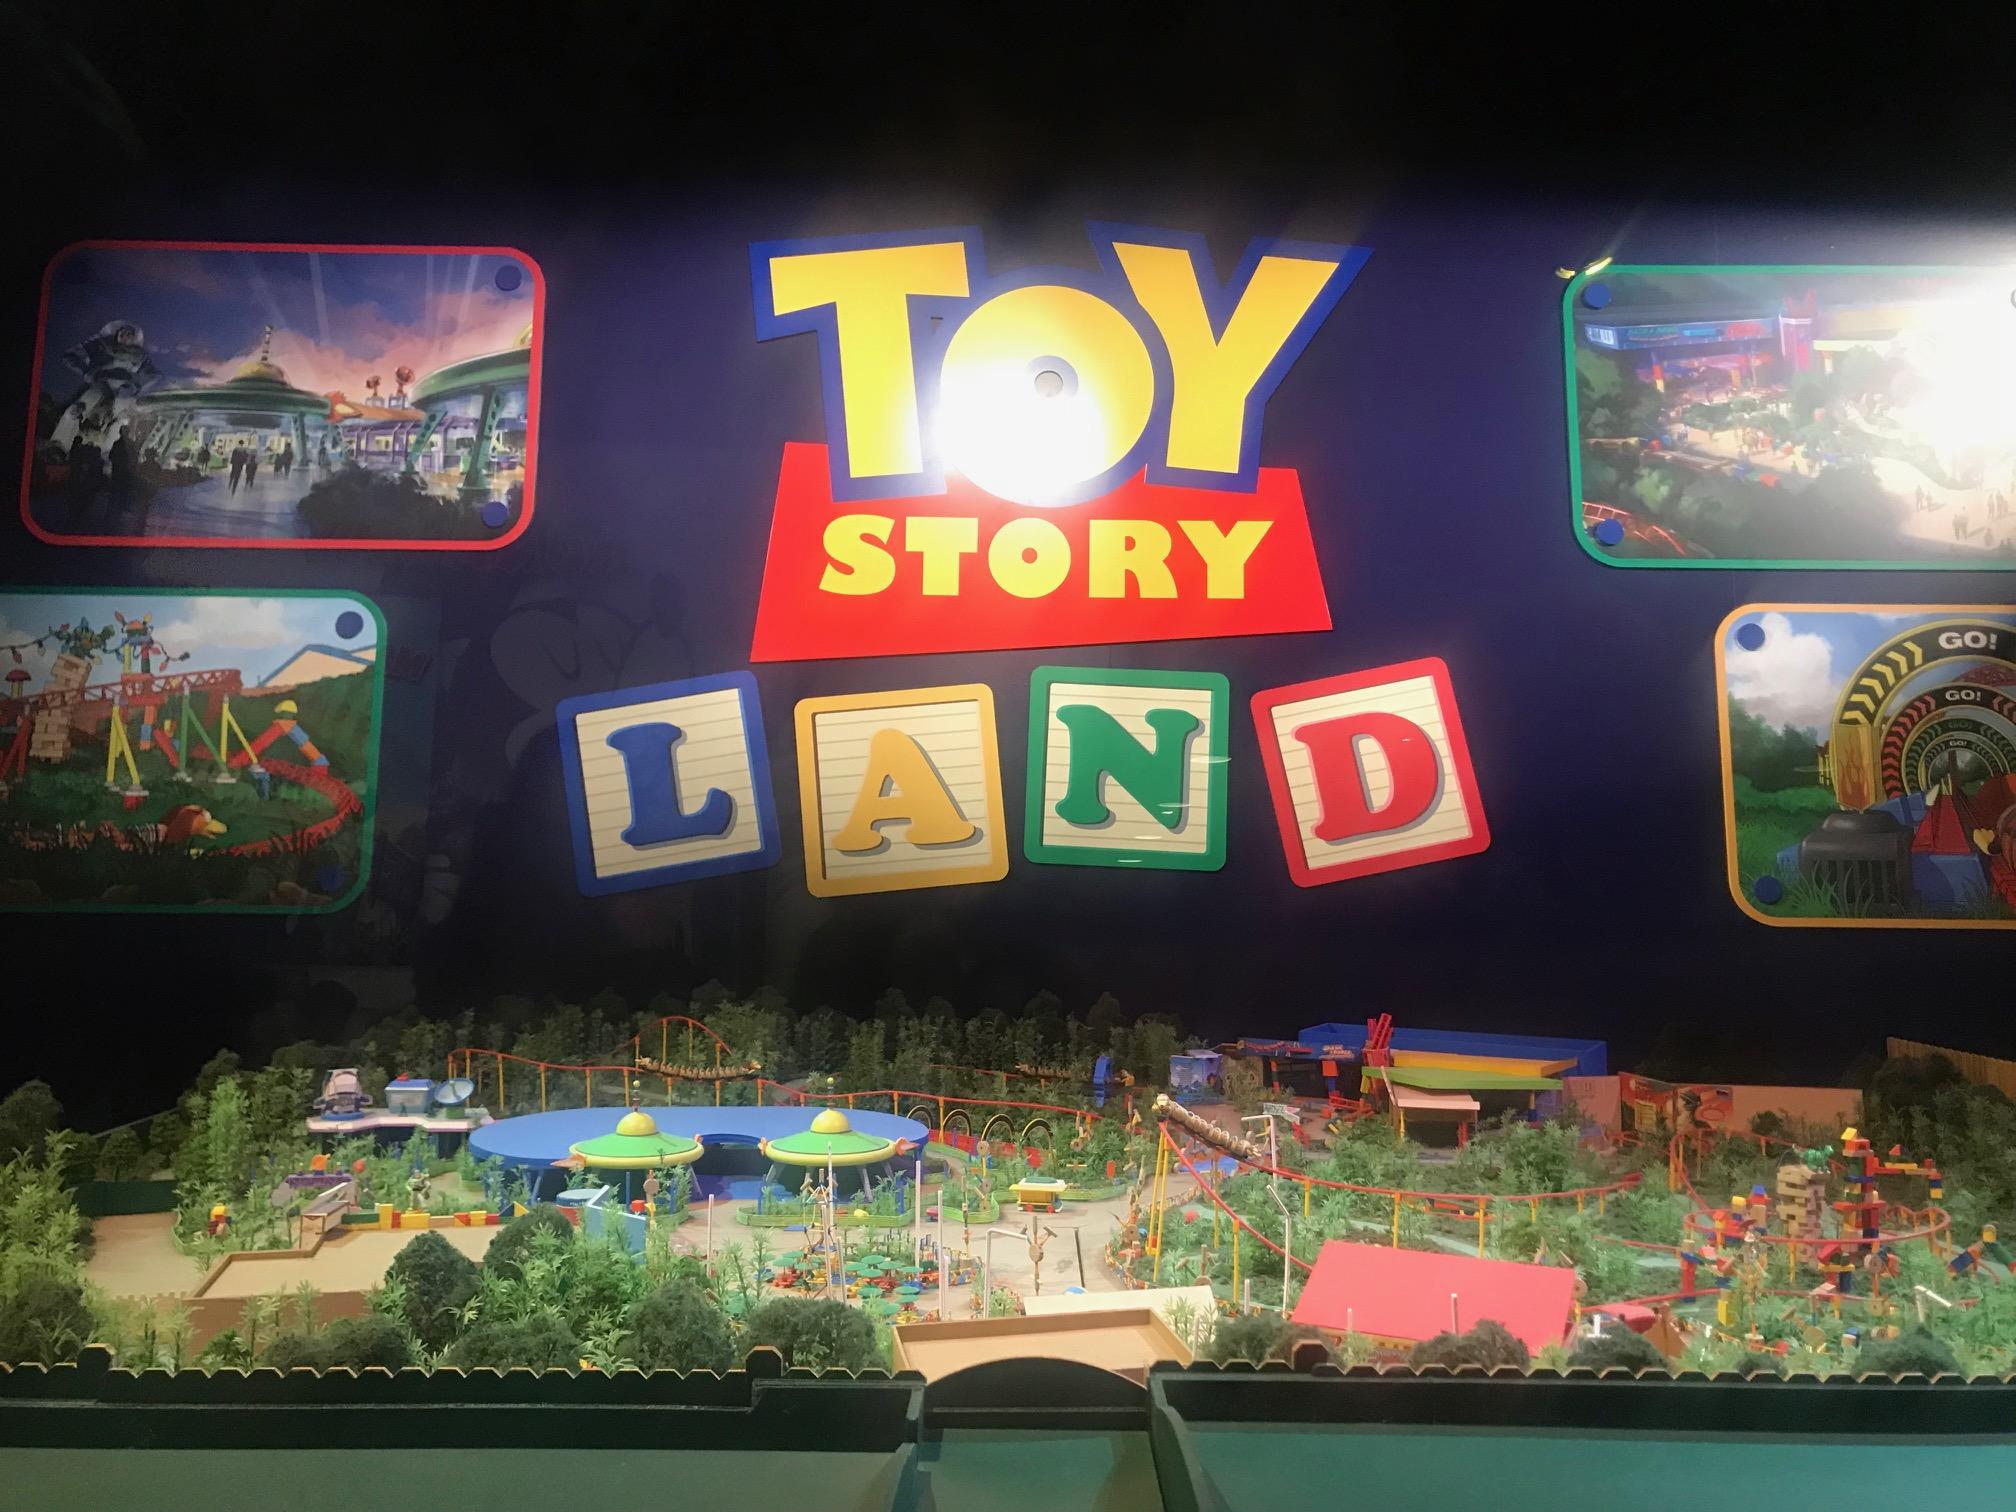 Toy Story Land at Disney's Hollywood Studios